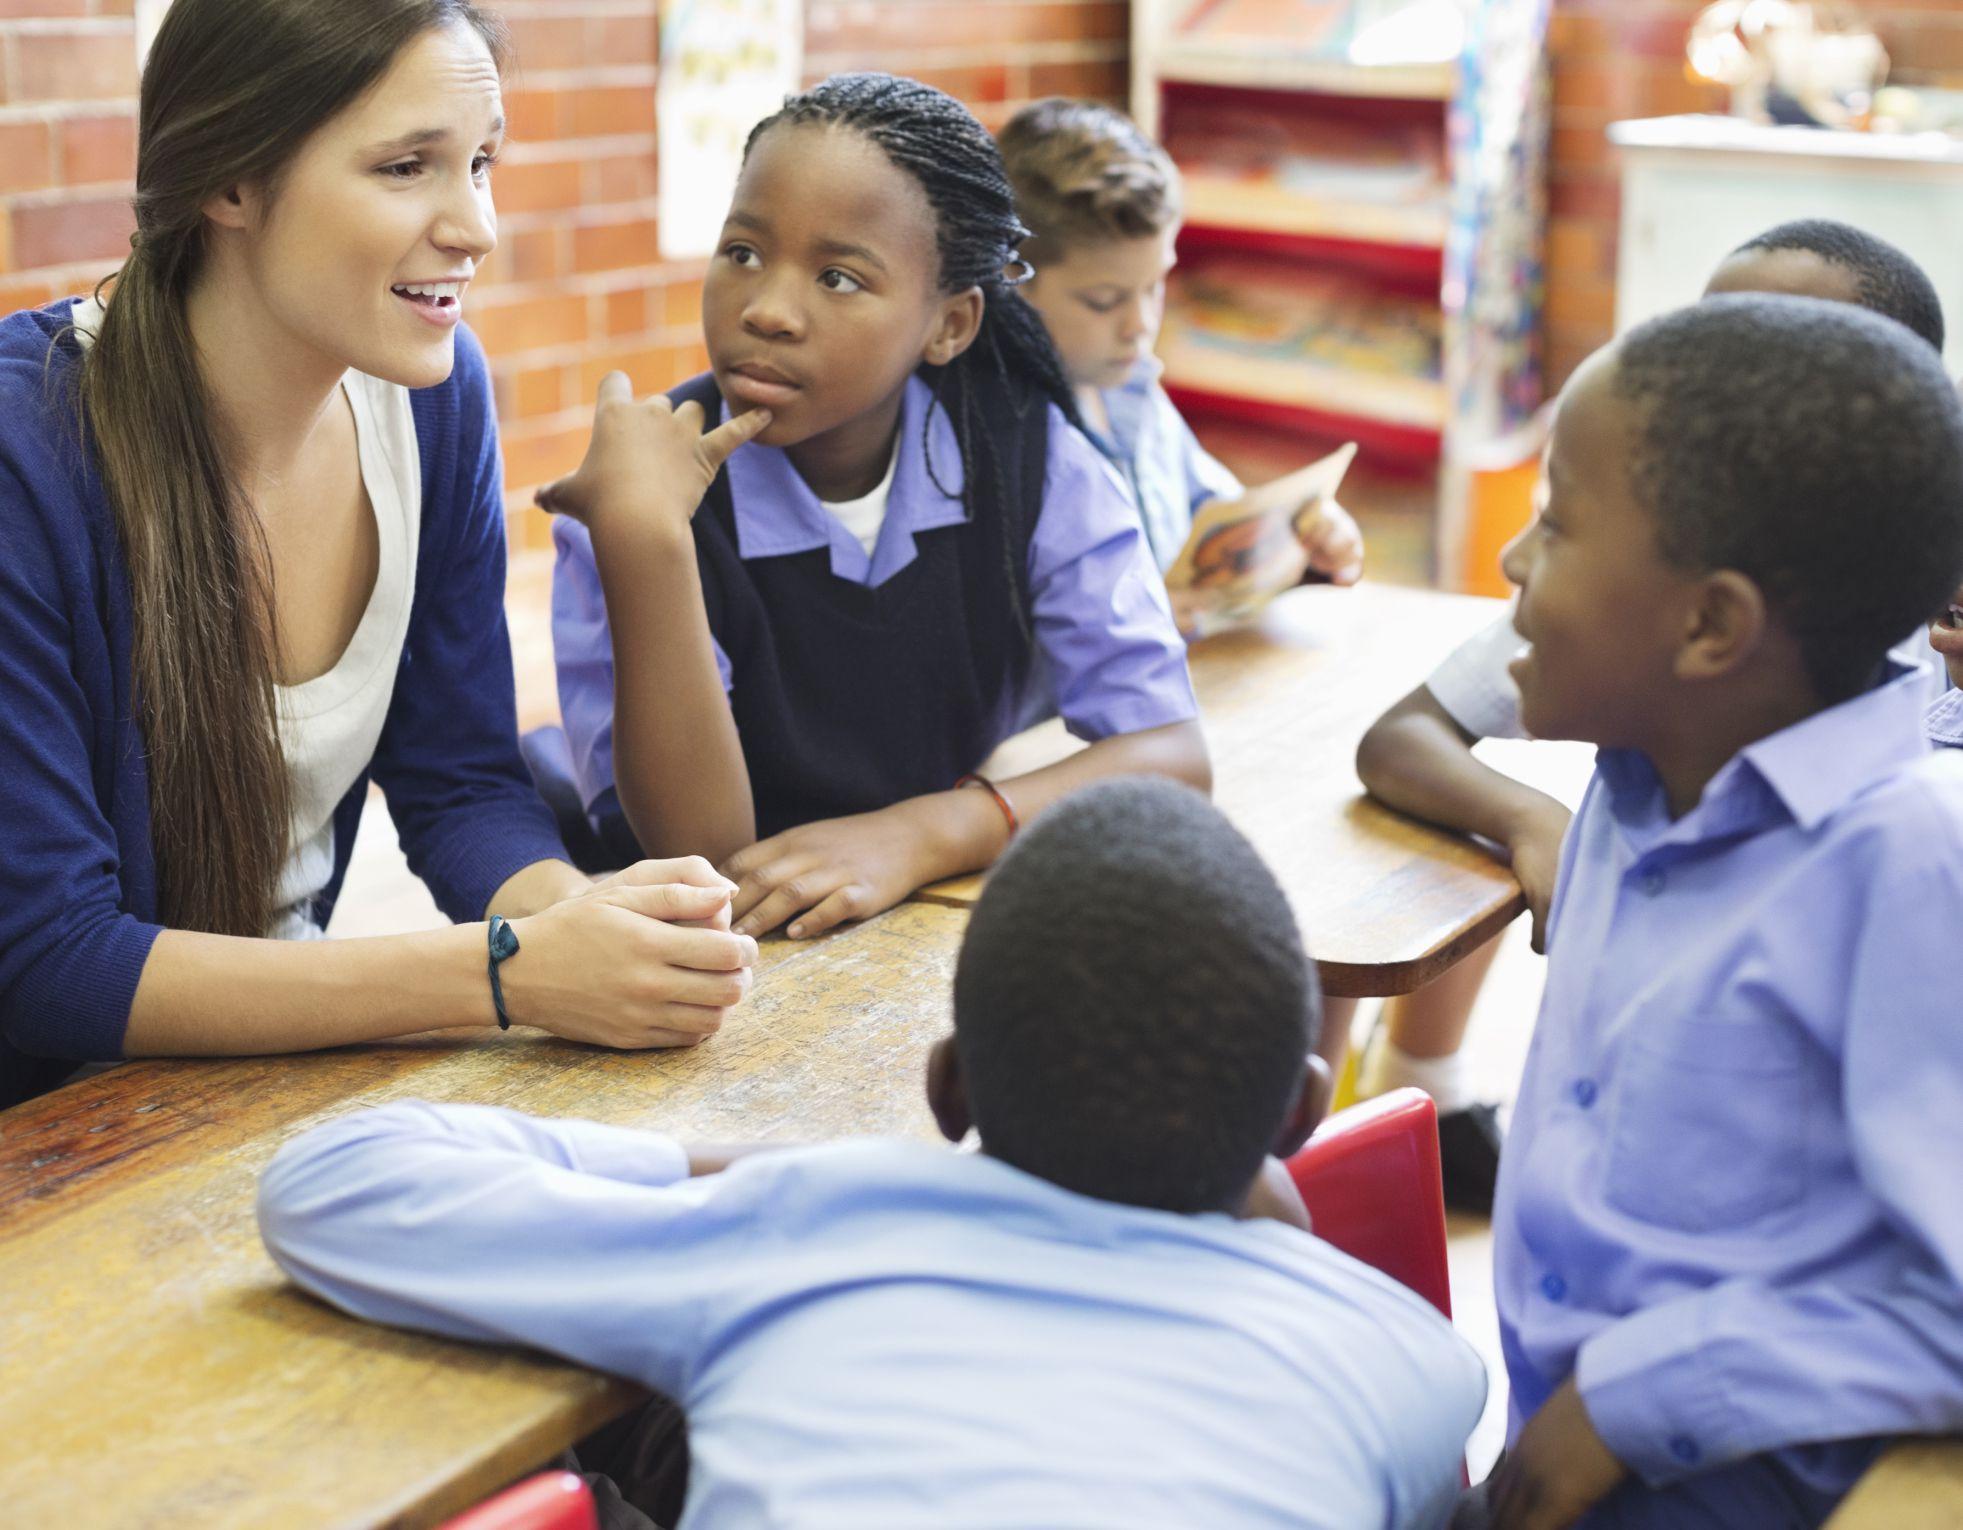 Should teachers date students